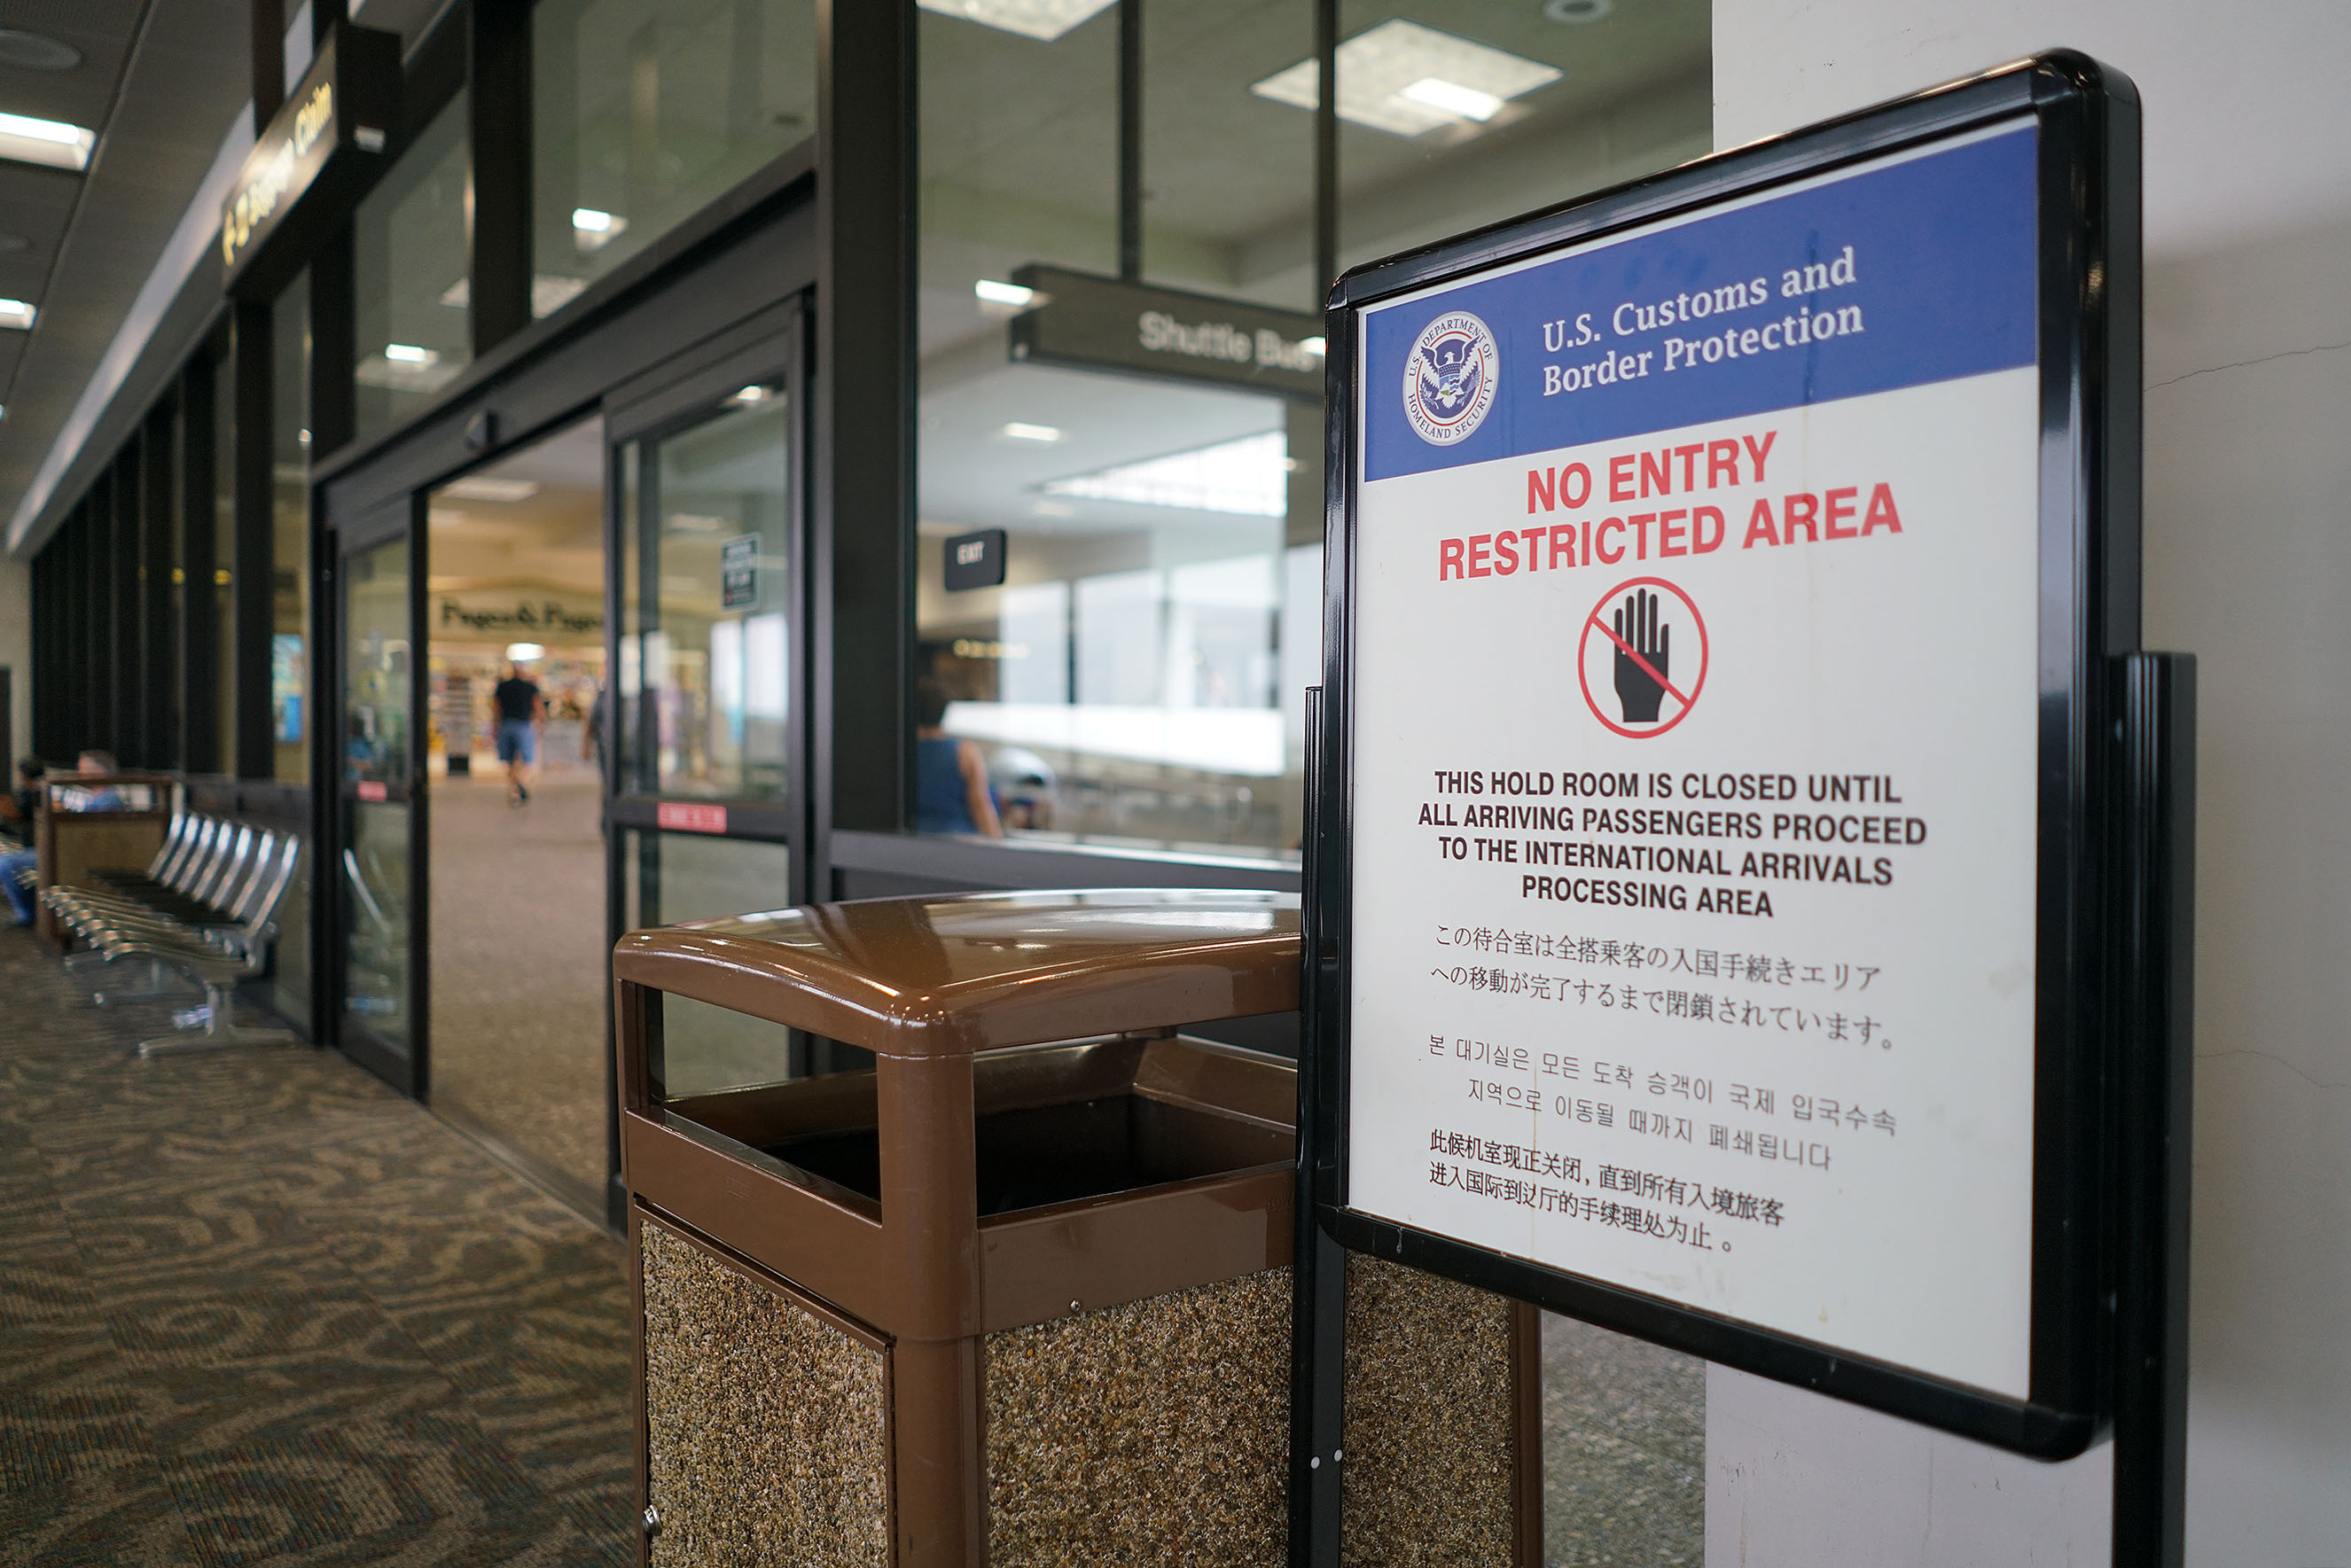 Honolulu International airport US Customs Border Protection sign. 14 sept 2016